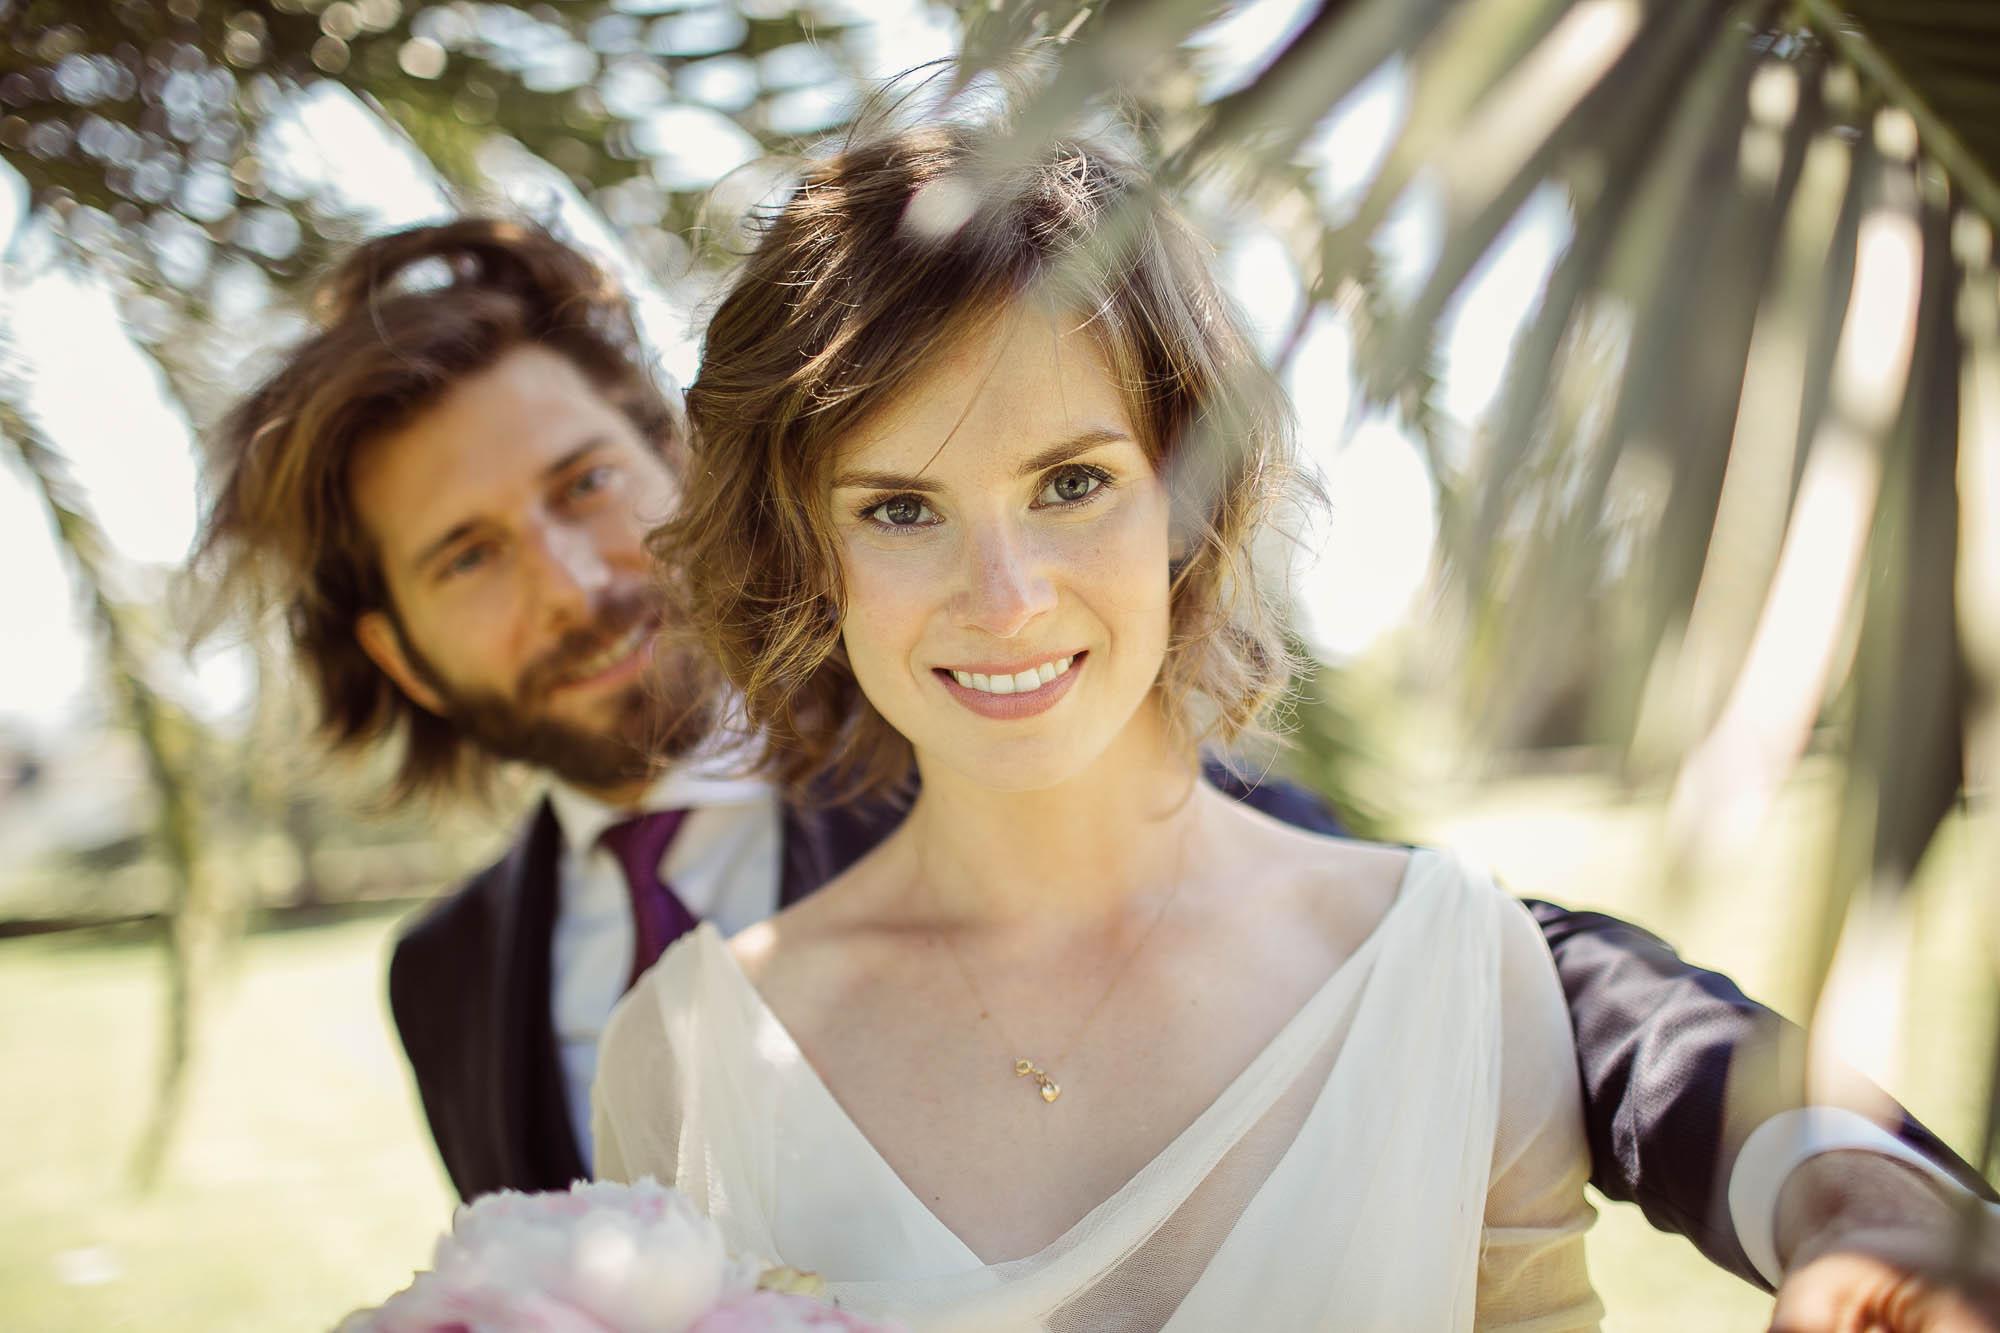 El novio aparece por detrás de la novia bajo la palmera